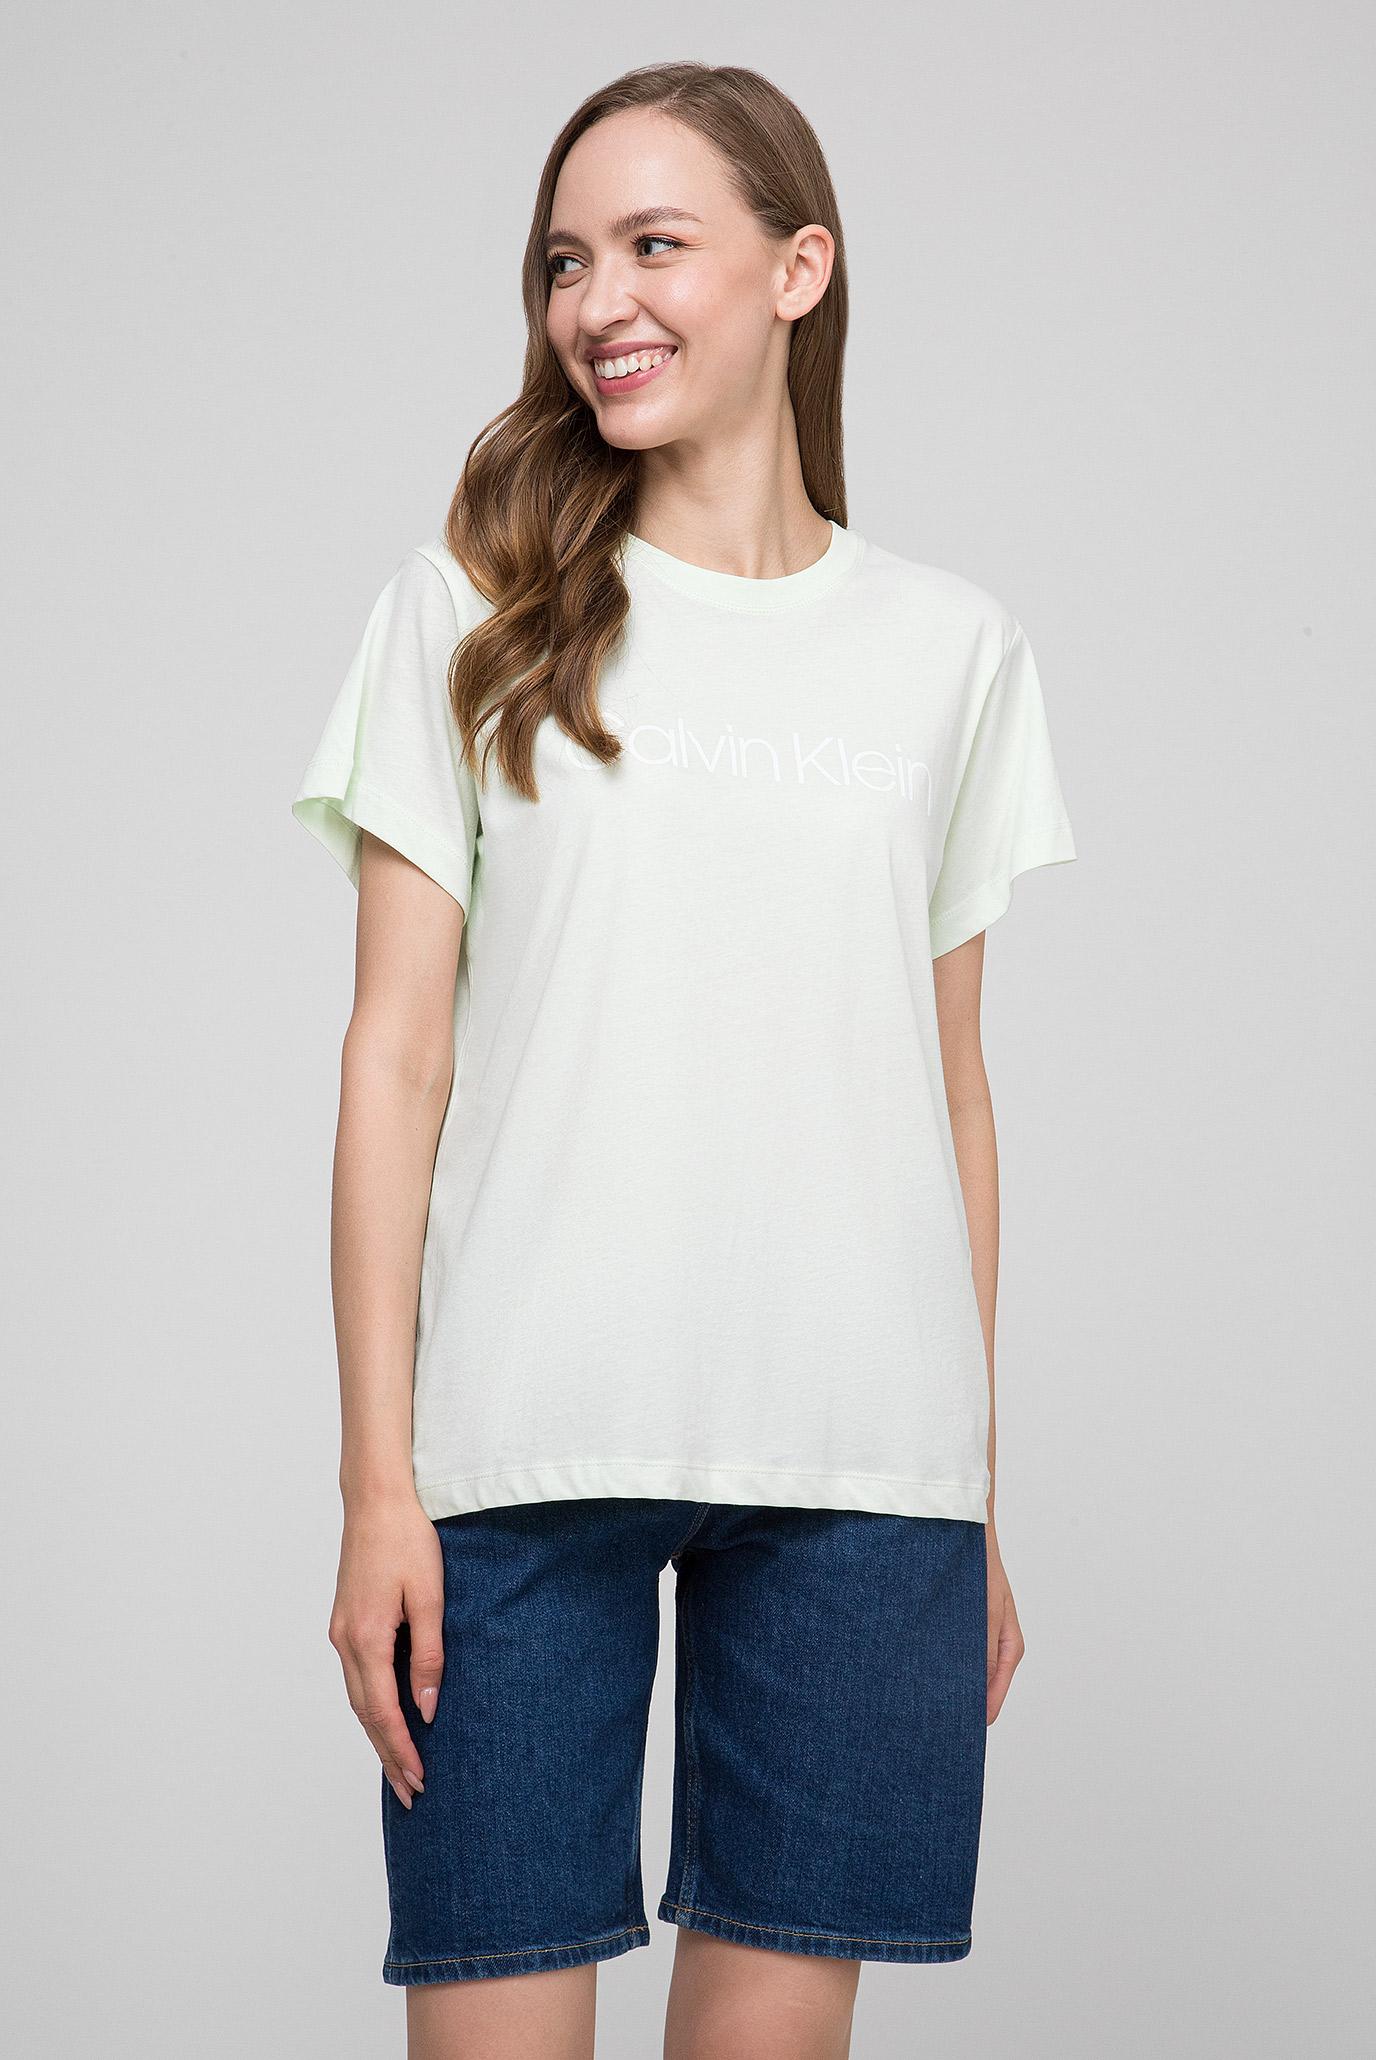 6d6c64da79b44 Купить Женская салатовая футболка LOGO PRT T-SHIRT SS Calvin Klein Calvin  Klein K20K200459 – Киев, Украина. Цены в интернет ...